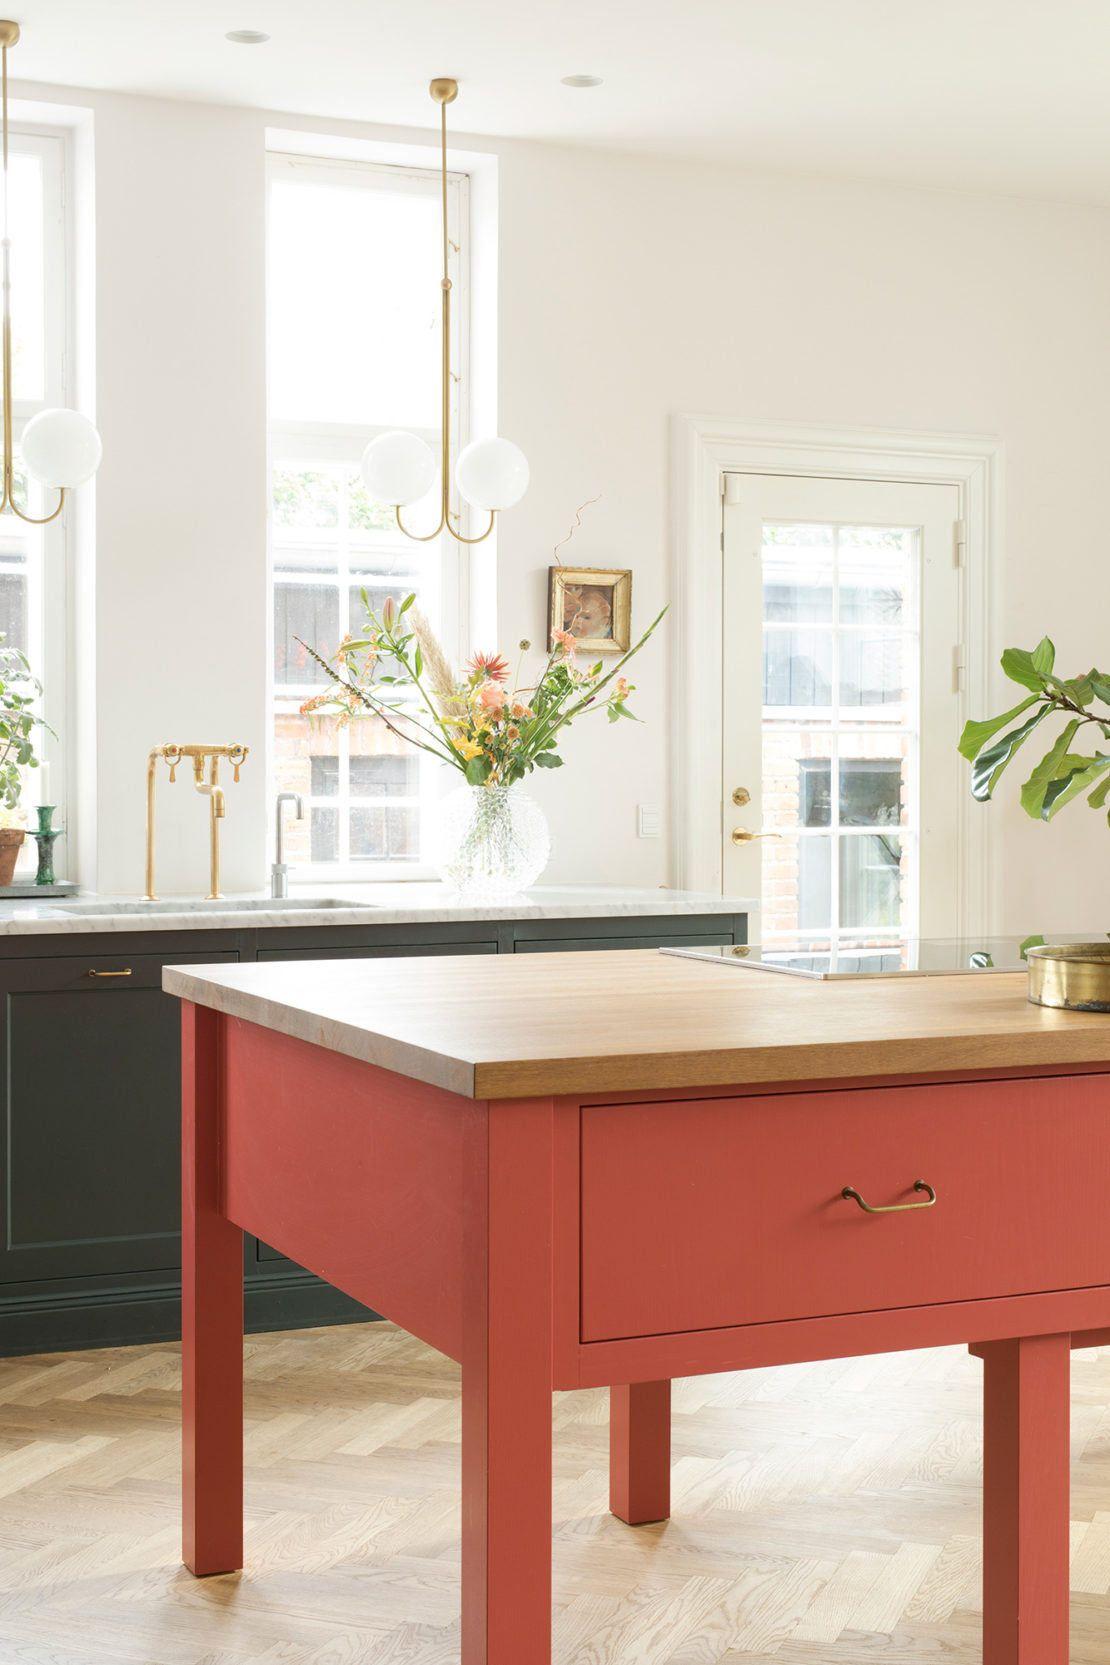 Classic Engish Kitchen Design in a Grand Copenhagen Remodel by Kvanum